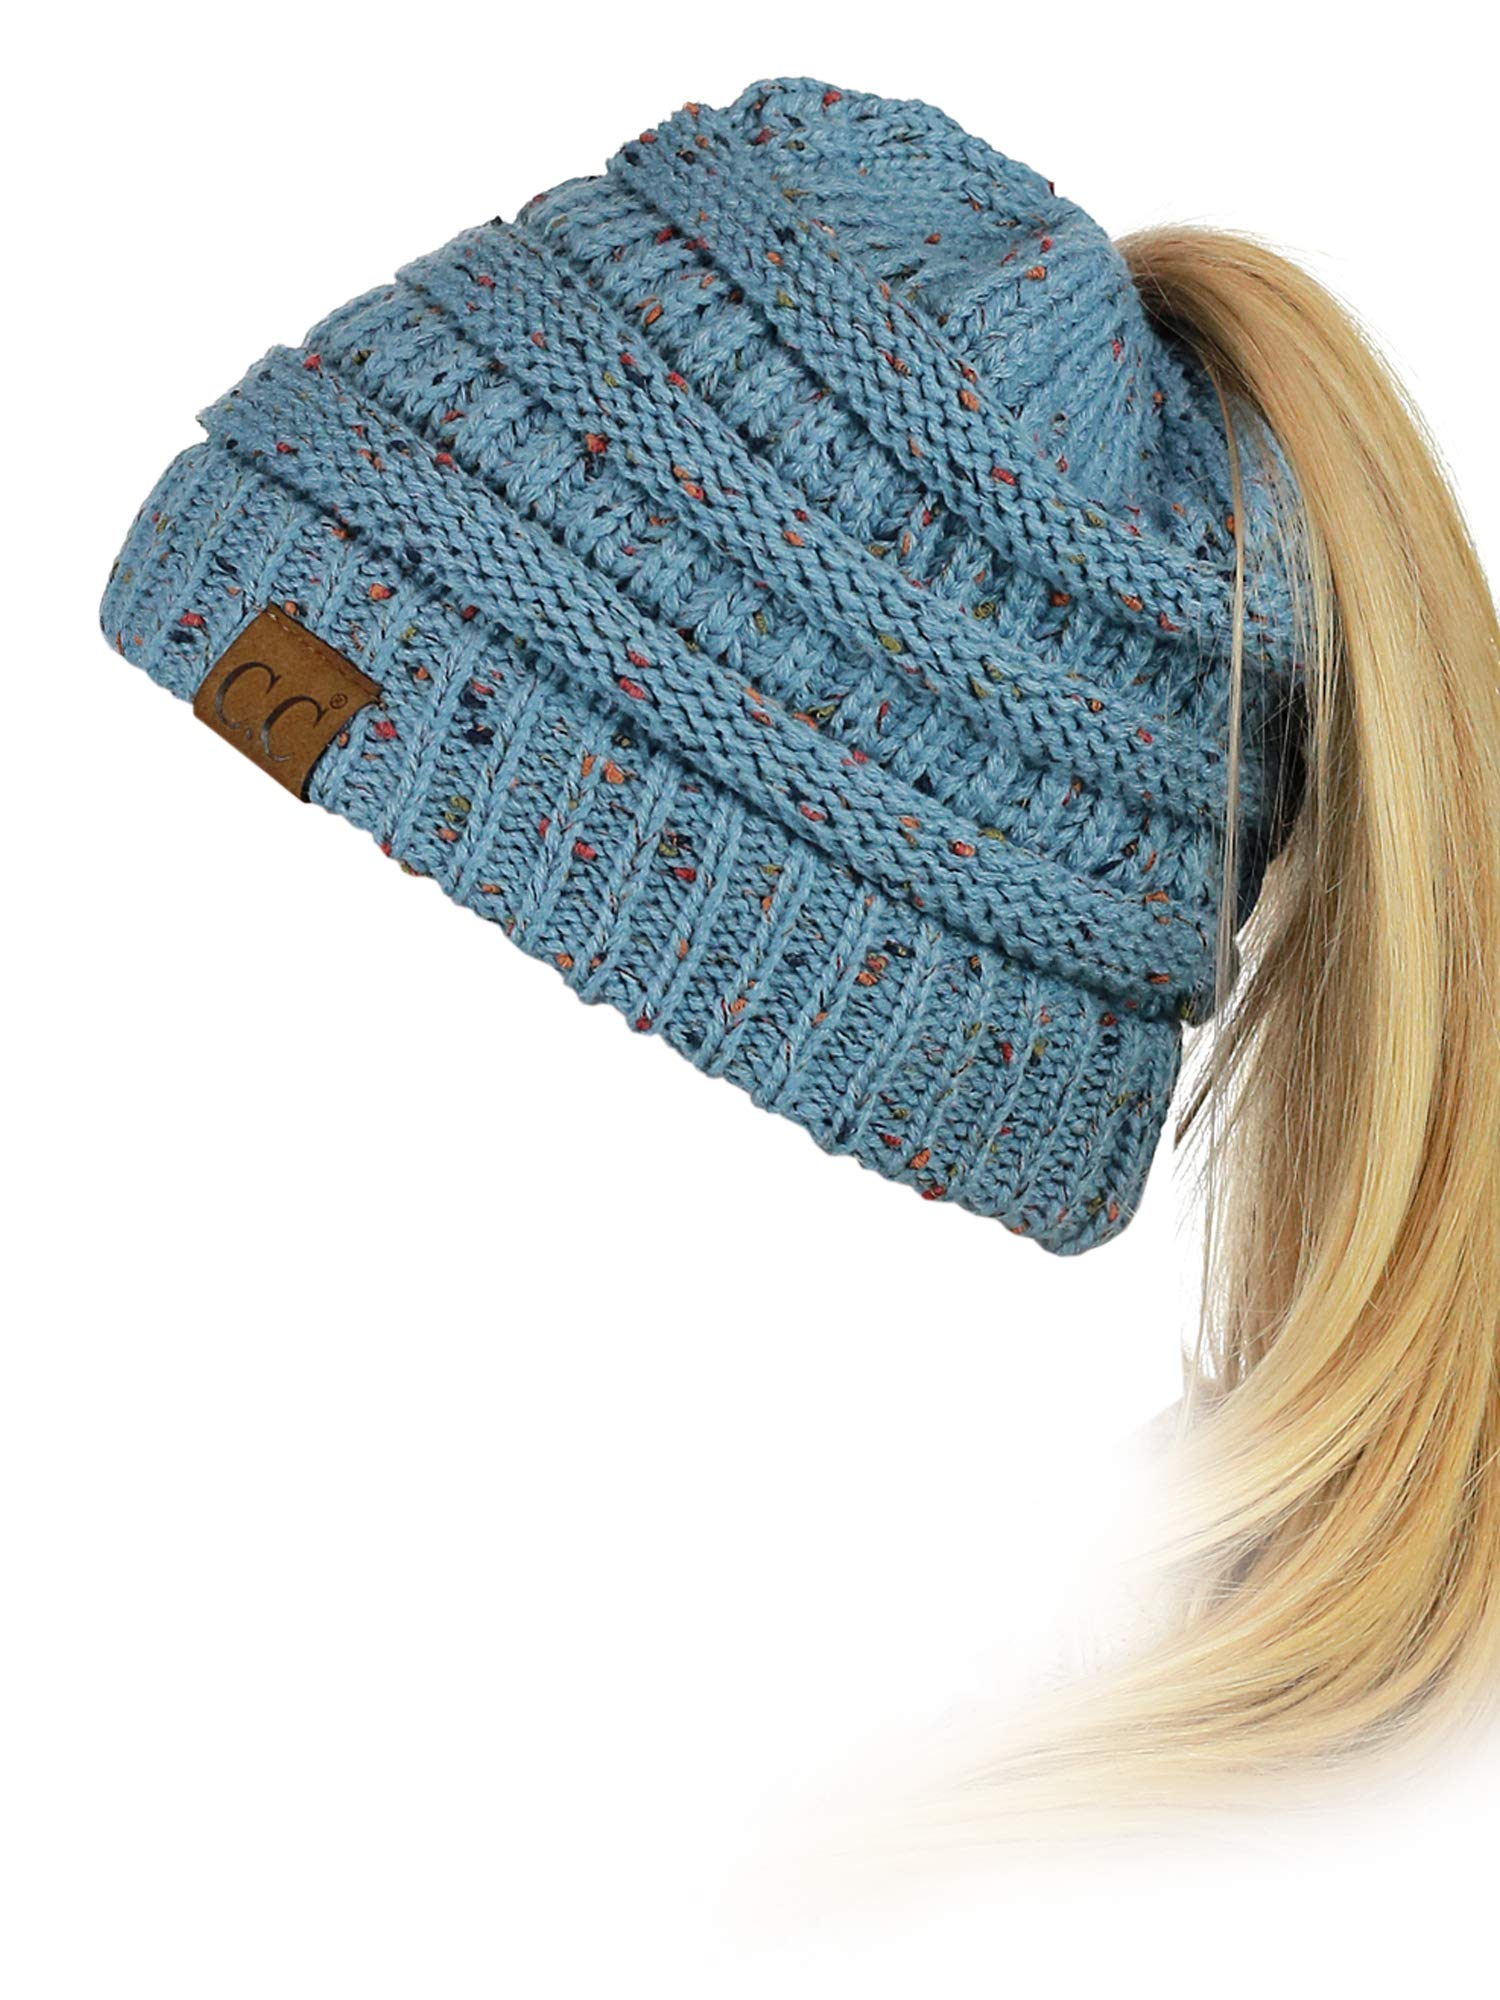 95deff0c58539 Galleon - C.C BeanieTail Soft Stretch Cable Knit Messy High Bun Ponytail Beanie  Hat